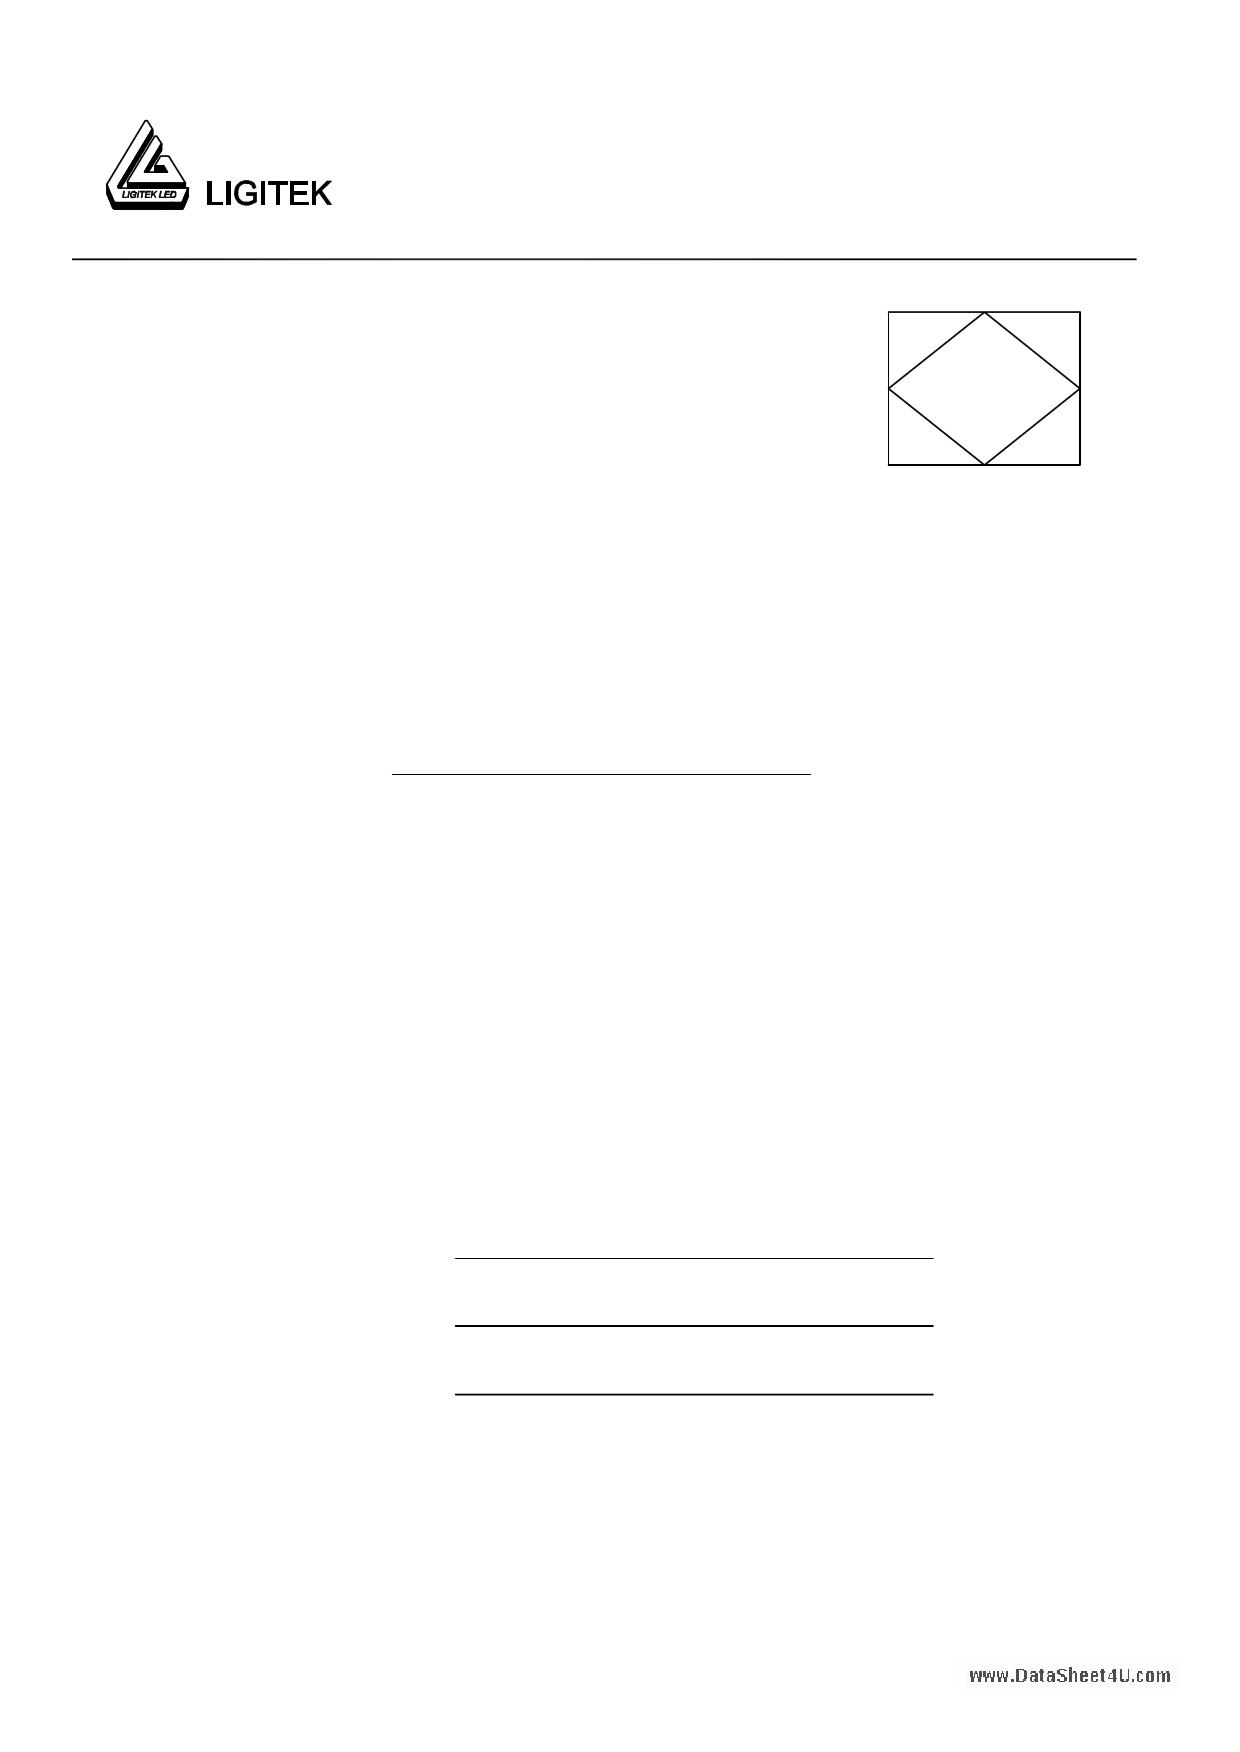 L-00501DBK-S-LF datasheet